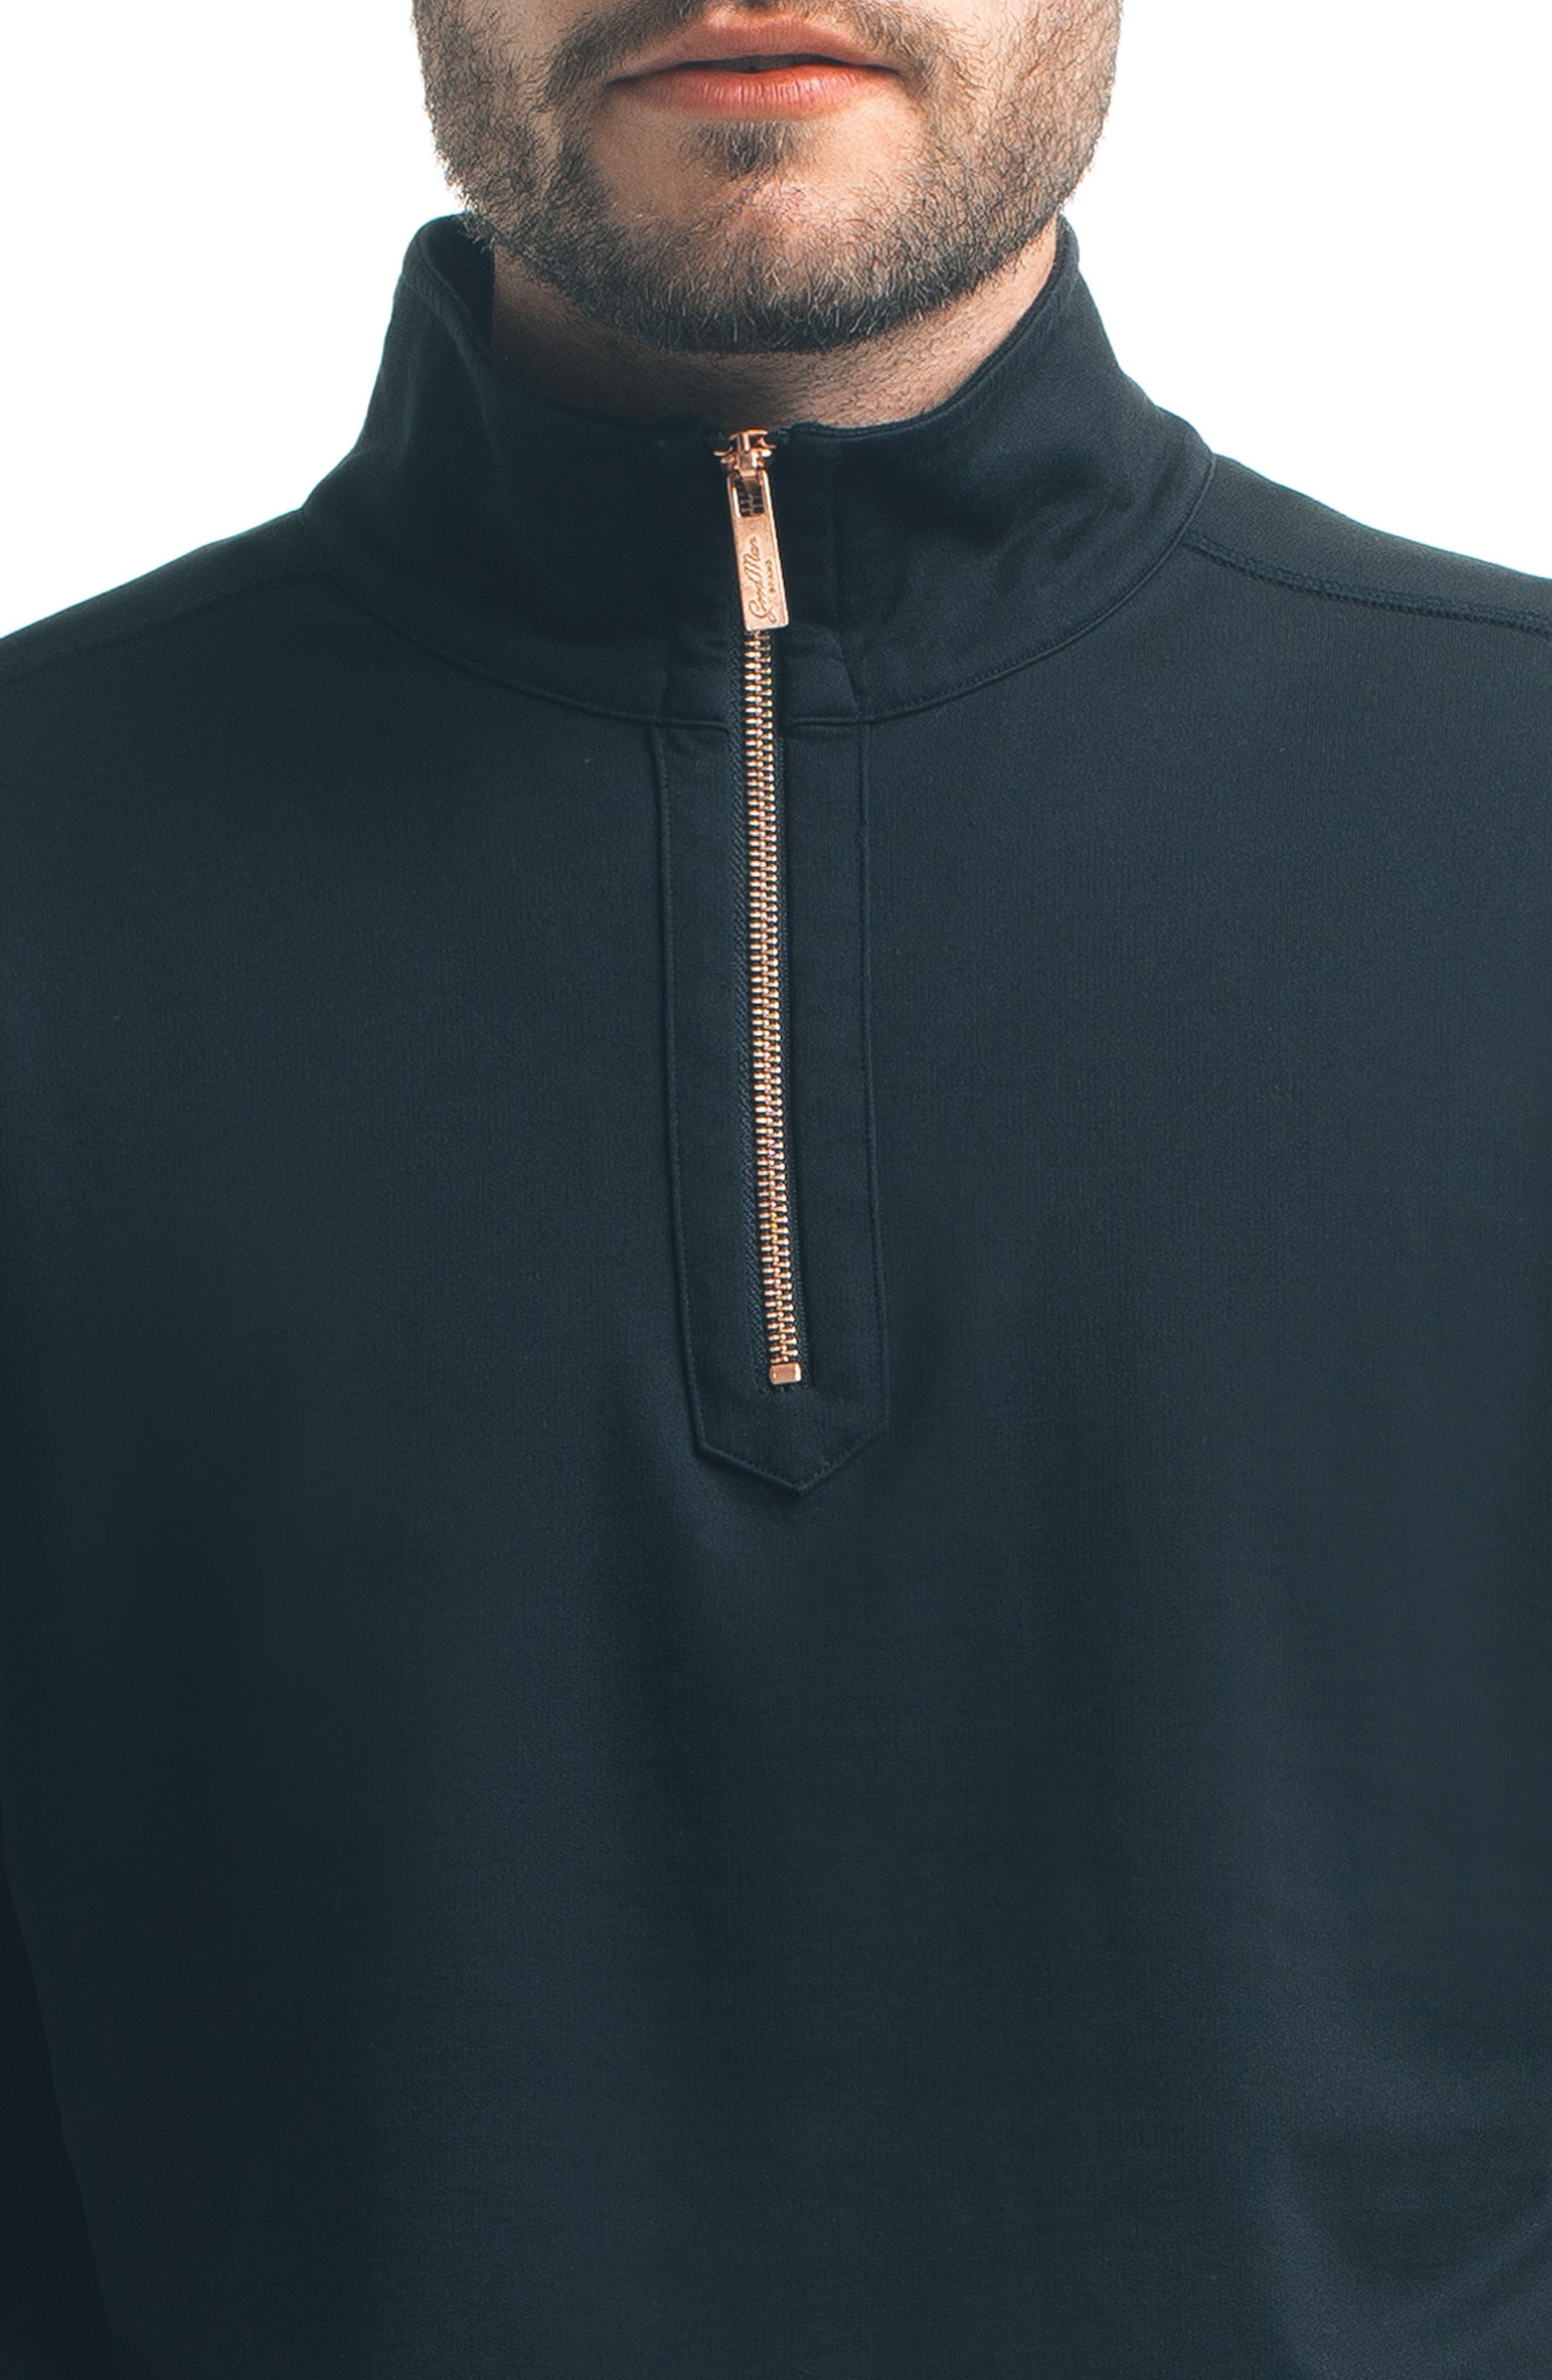 Slim Pro Quarter Zip Pullover,                             Alternate thumbnail 4, color,                             Black